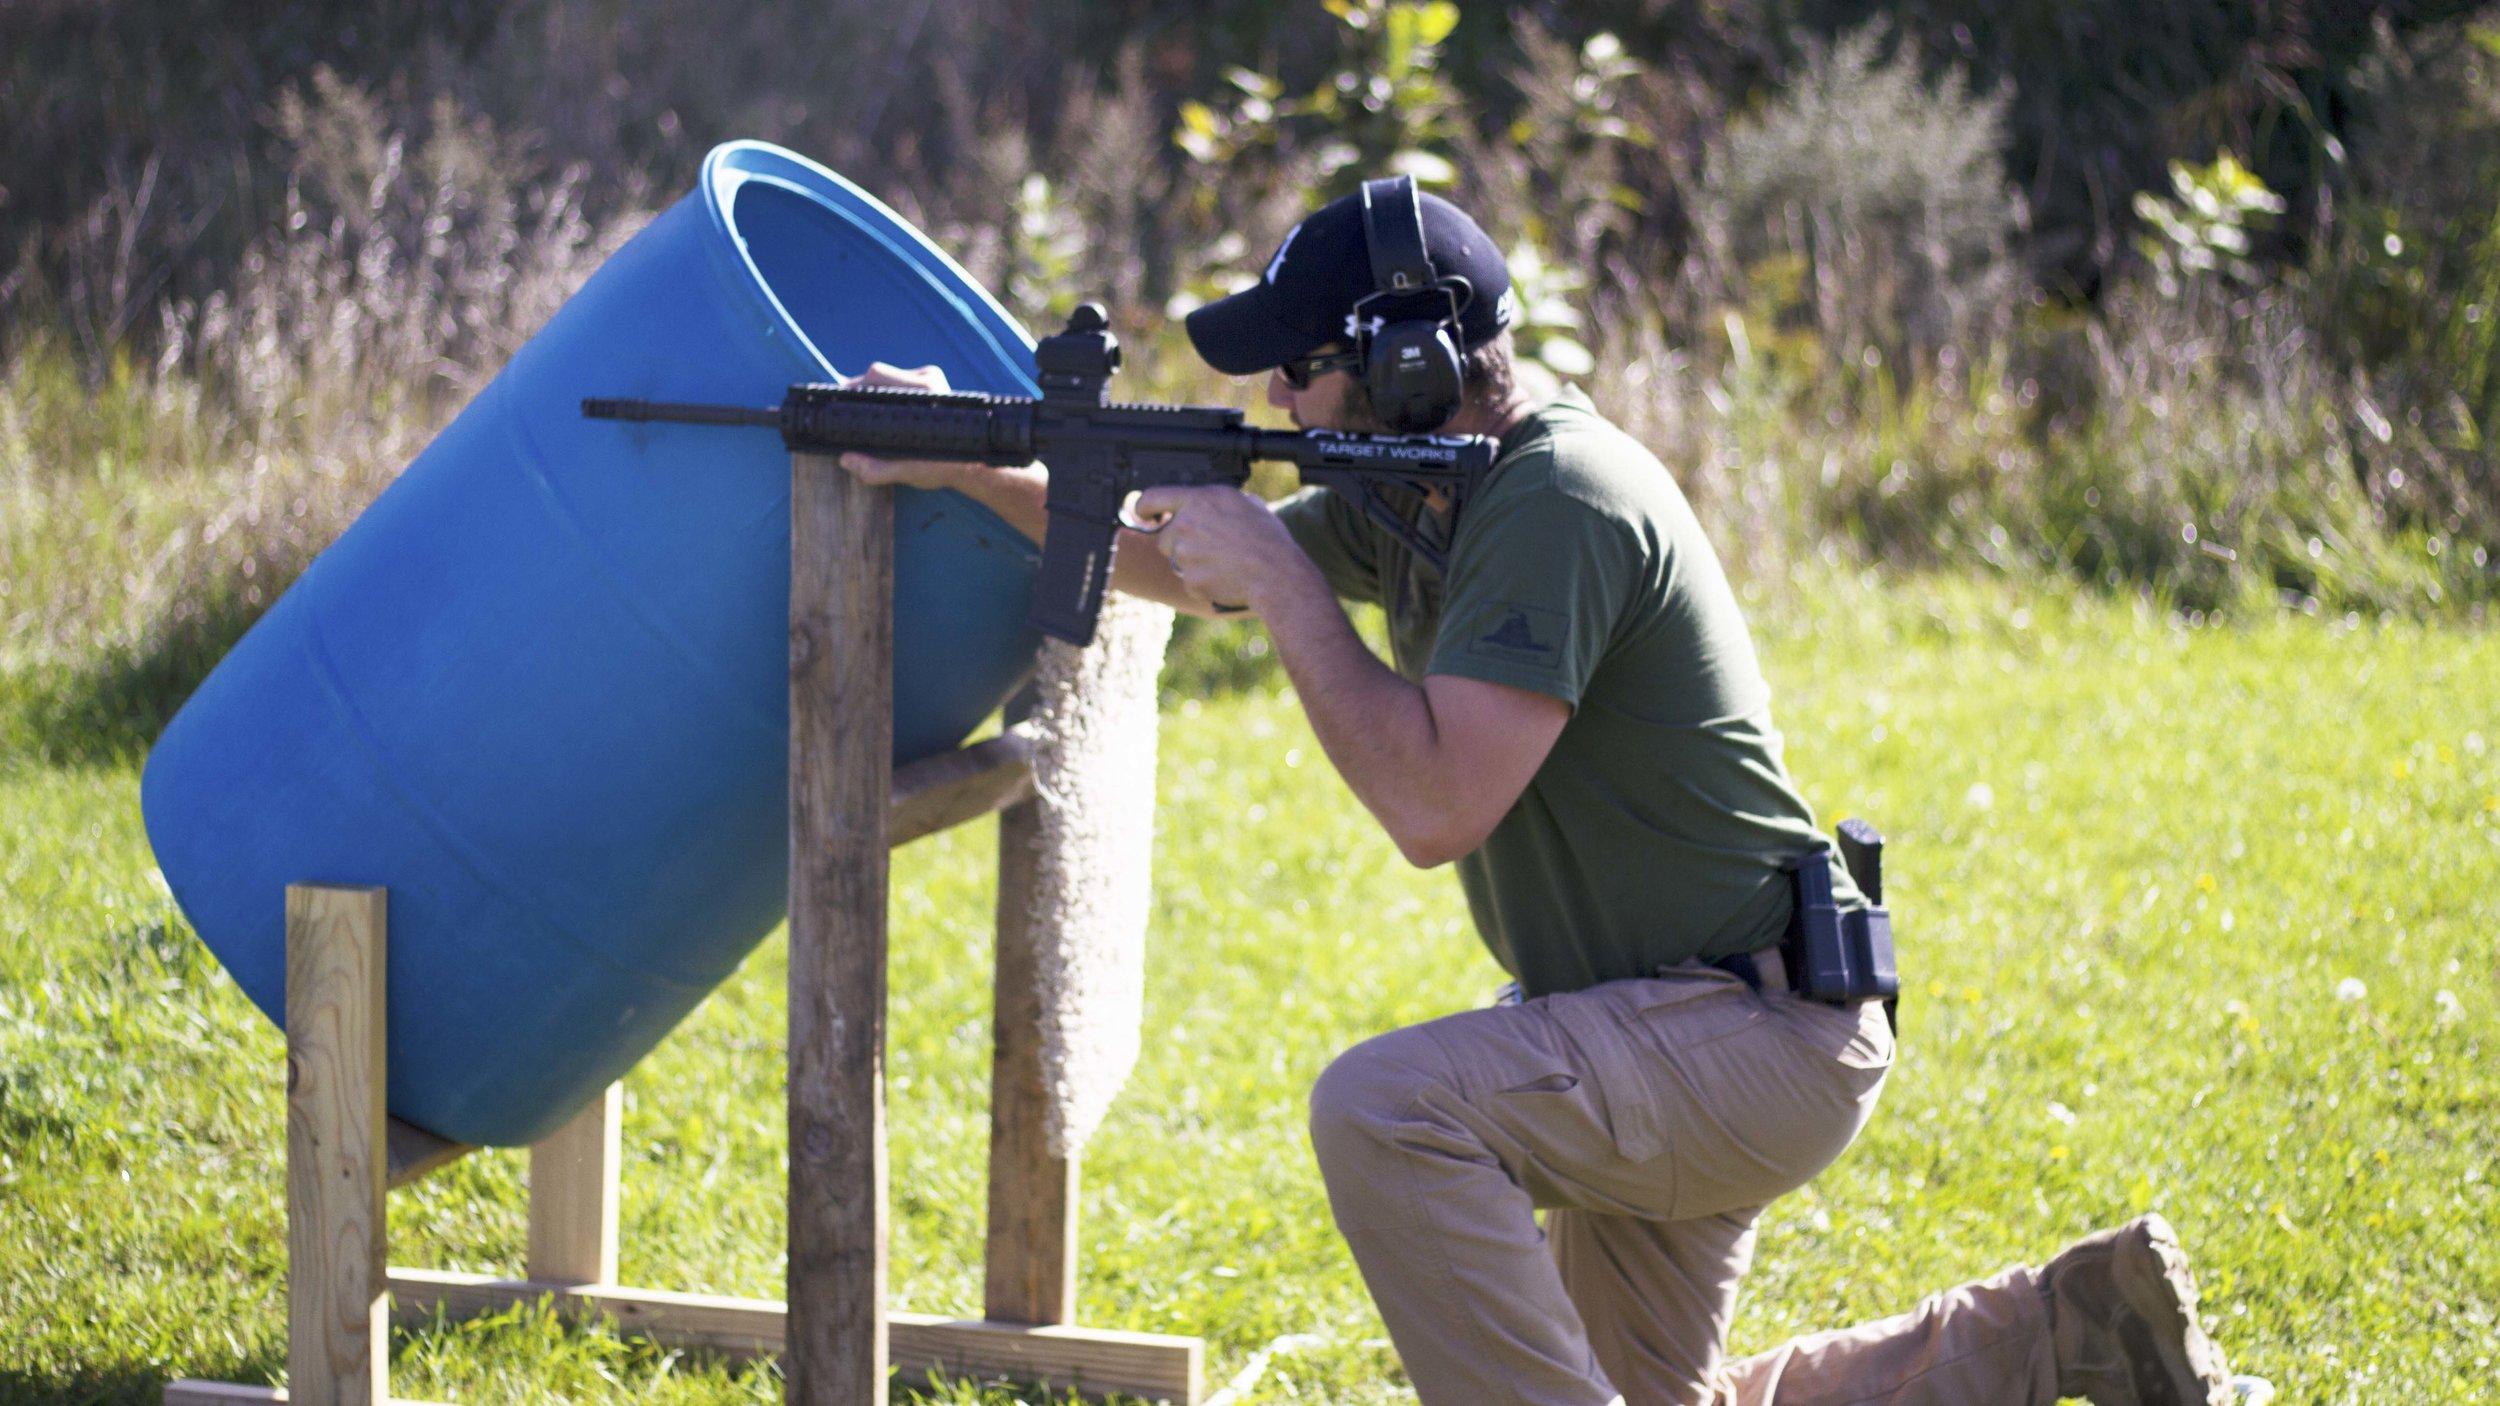 Brad Kneeling with Rifle.jpg